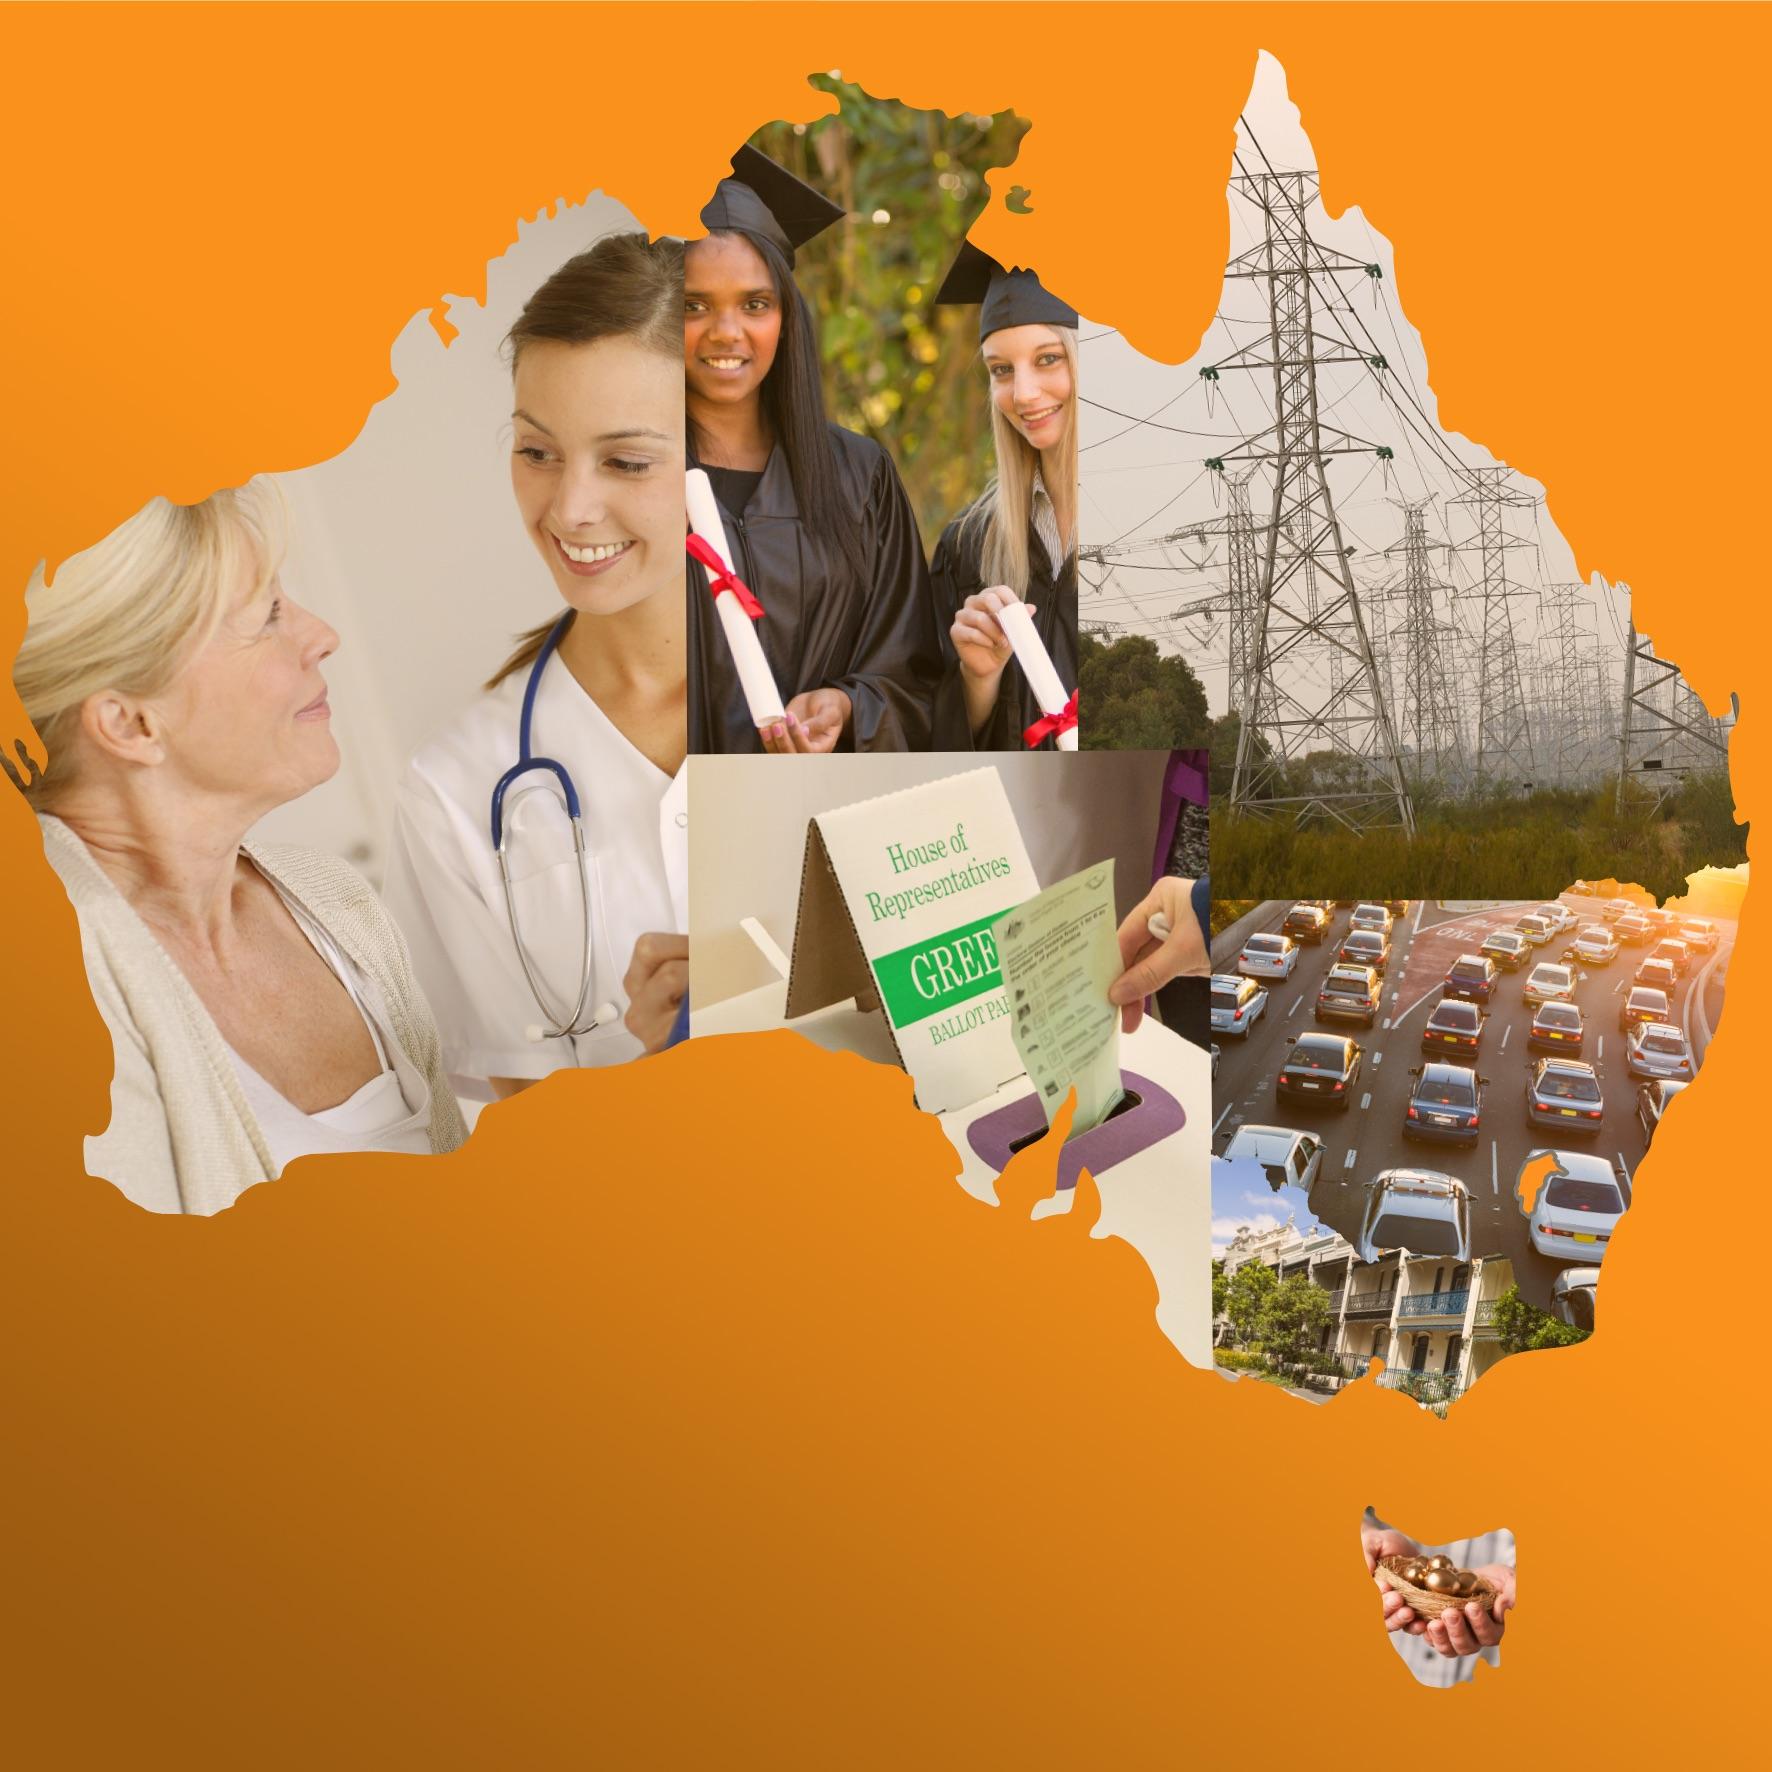 Federal Election 2019: Big ideas for Australia's next government - Melbourne